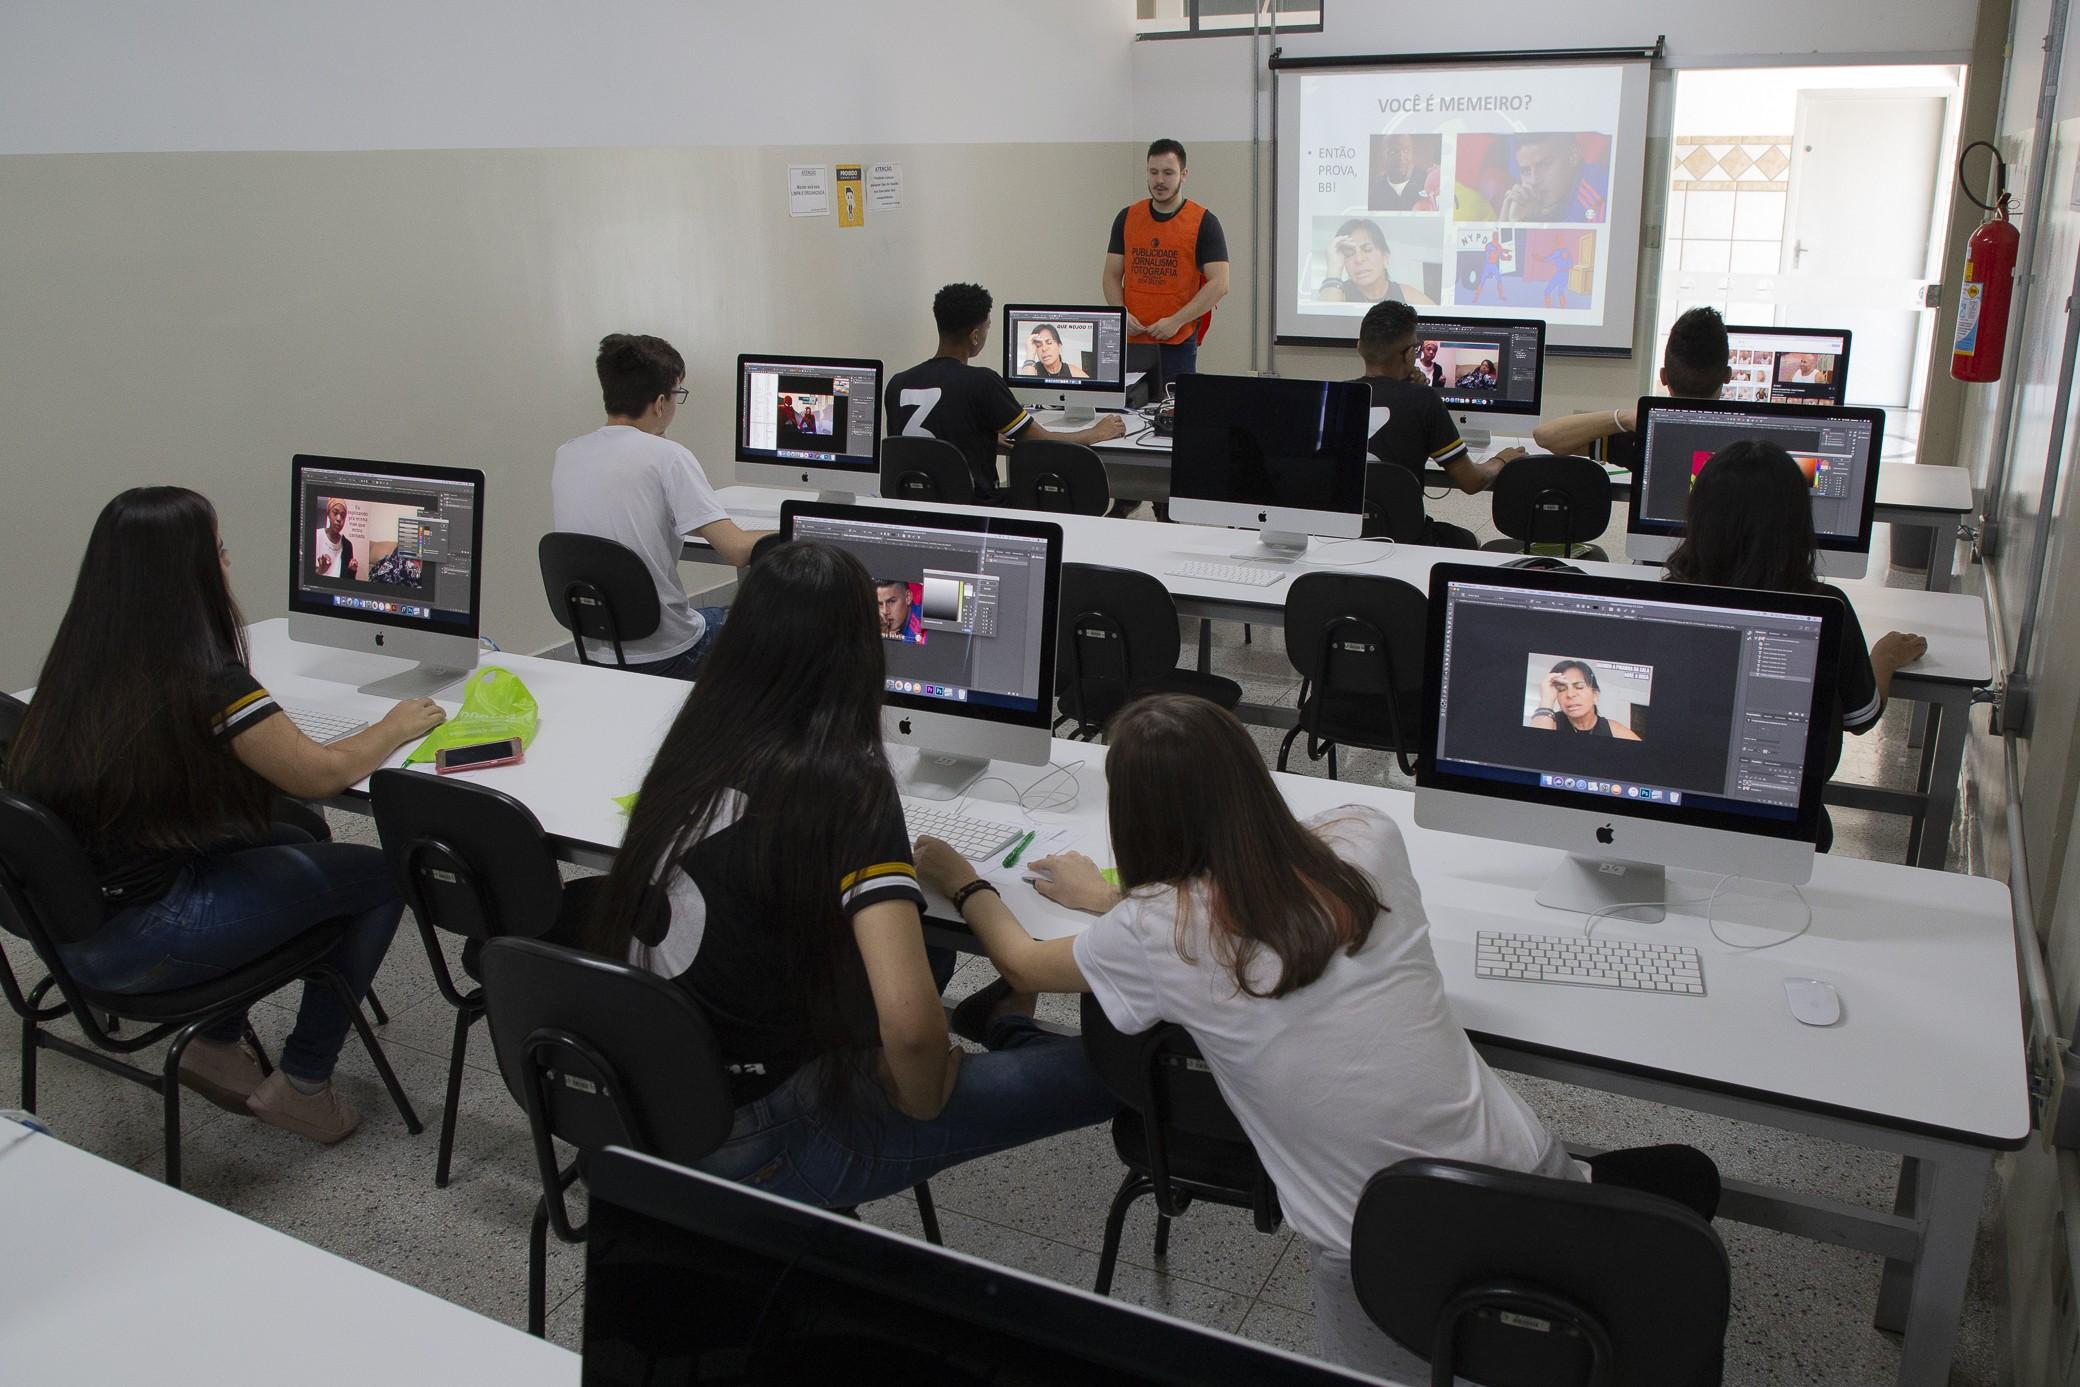 Truques de Photoshop surpreende alunos do ensino médio